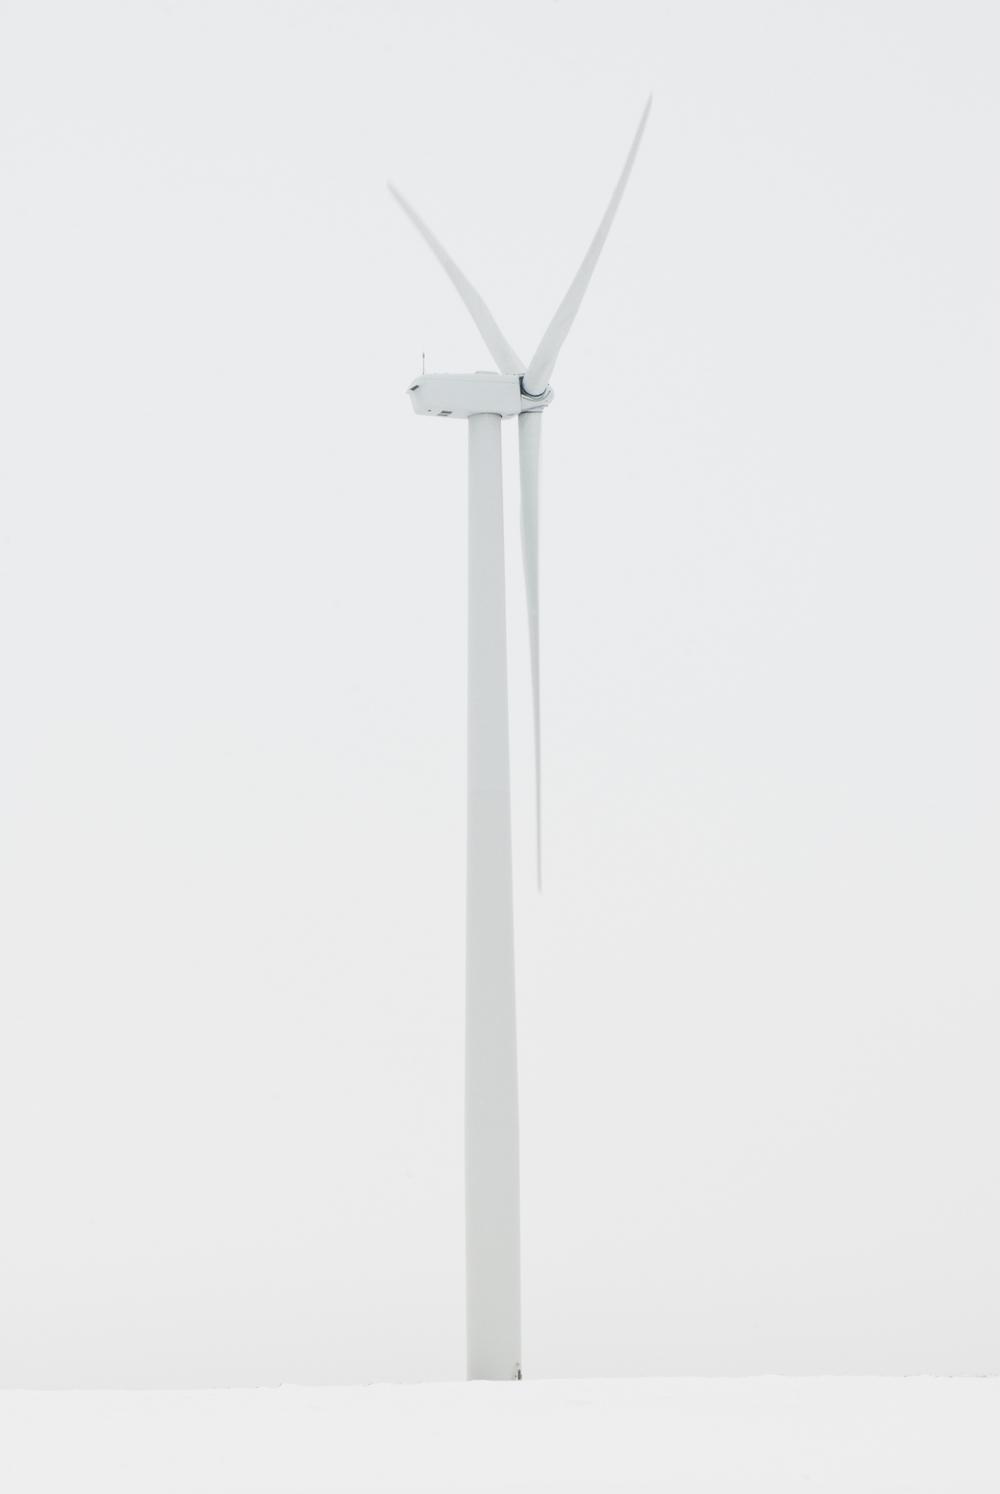 wind_farm_009.jpg